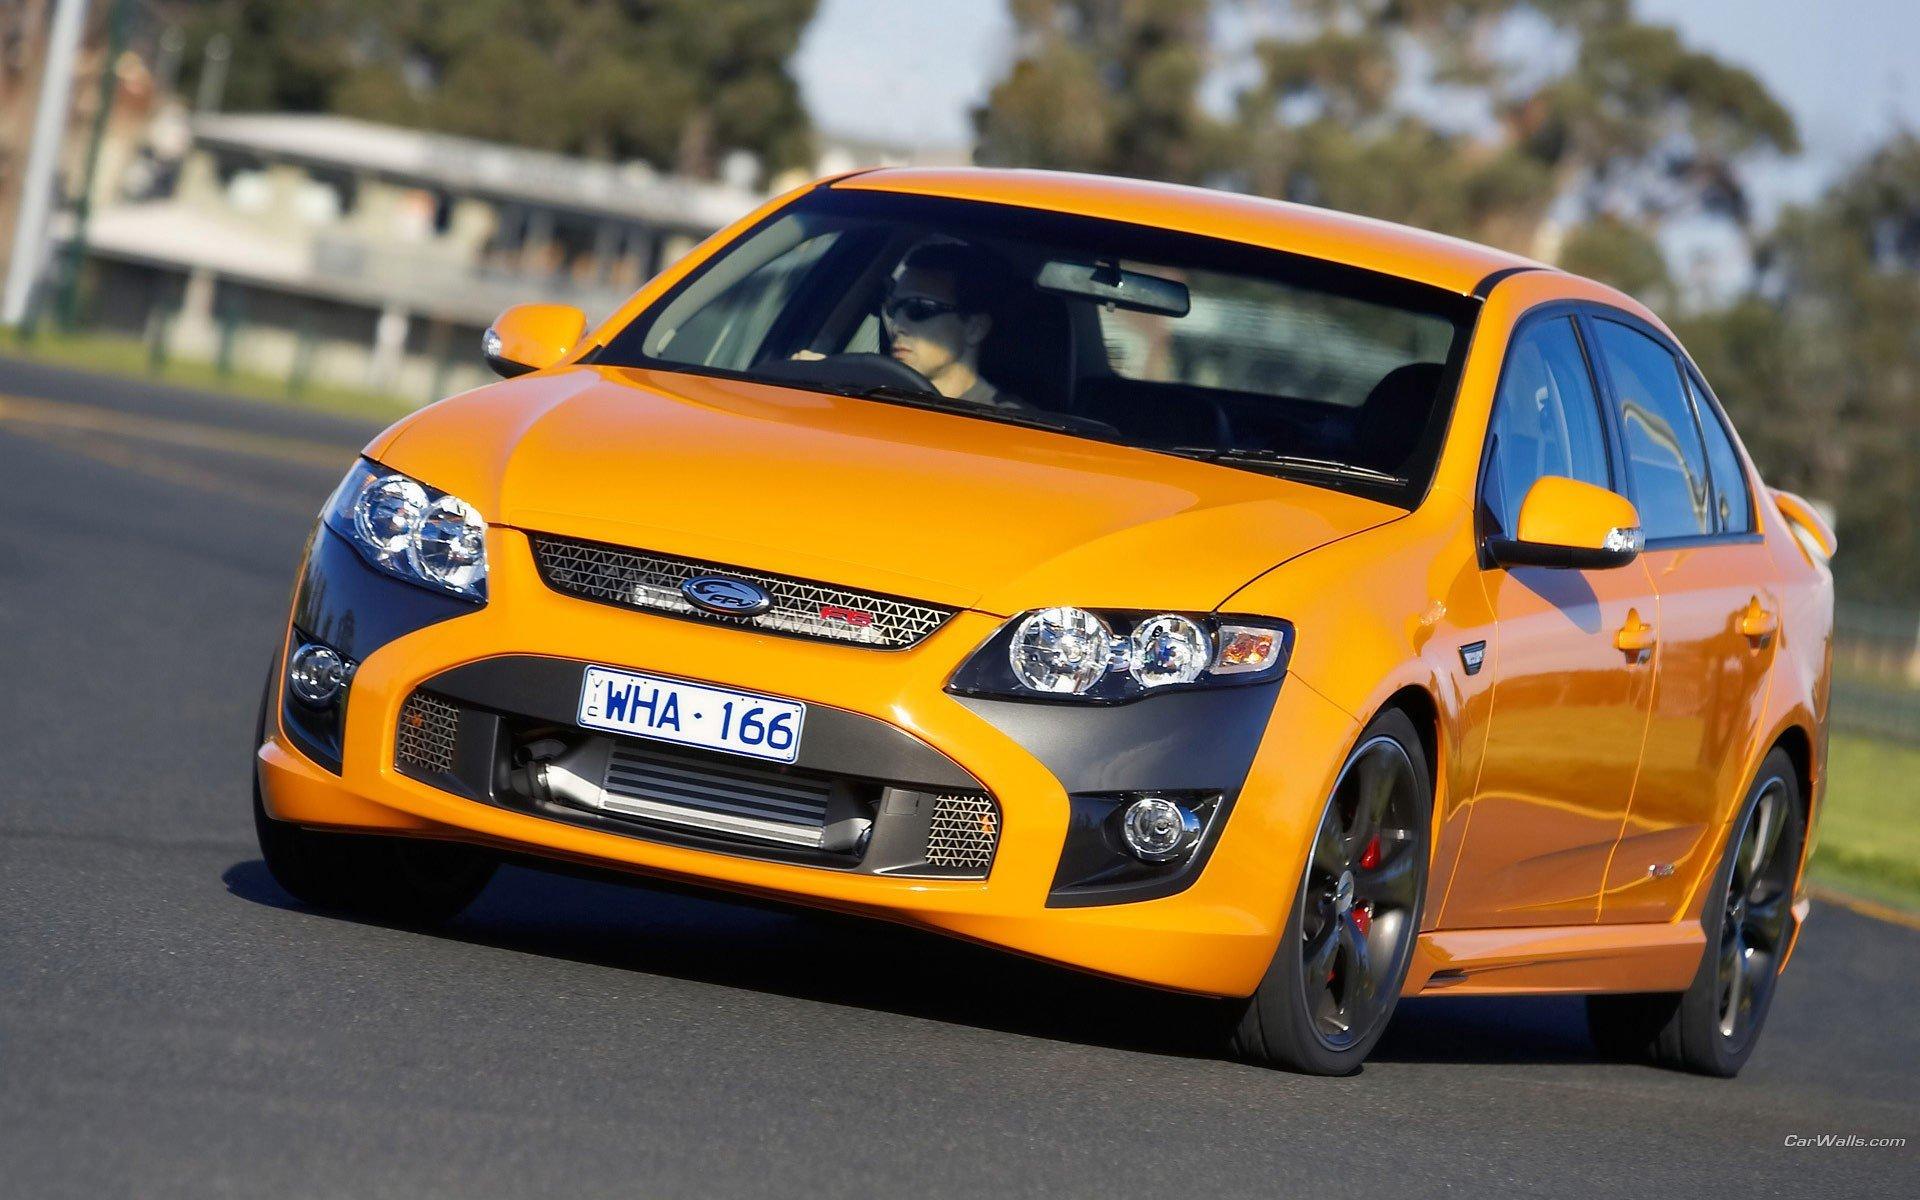 Cars ford fpv ford falcon aussie muscle car ford australia fpv f6 f6 310 wallpaper 1920x1200 334409 wallpaperup